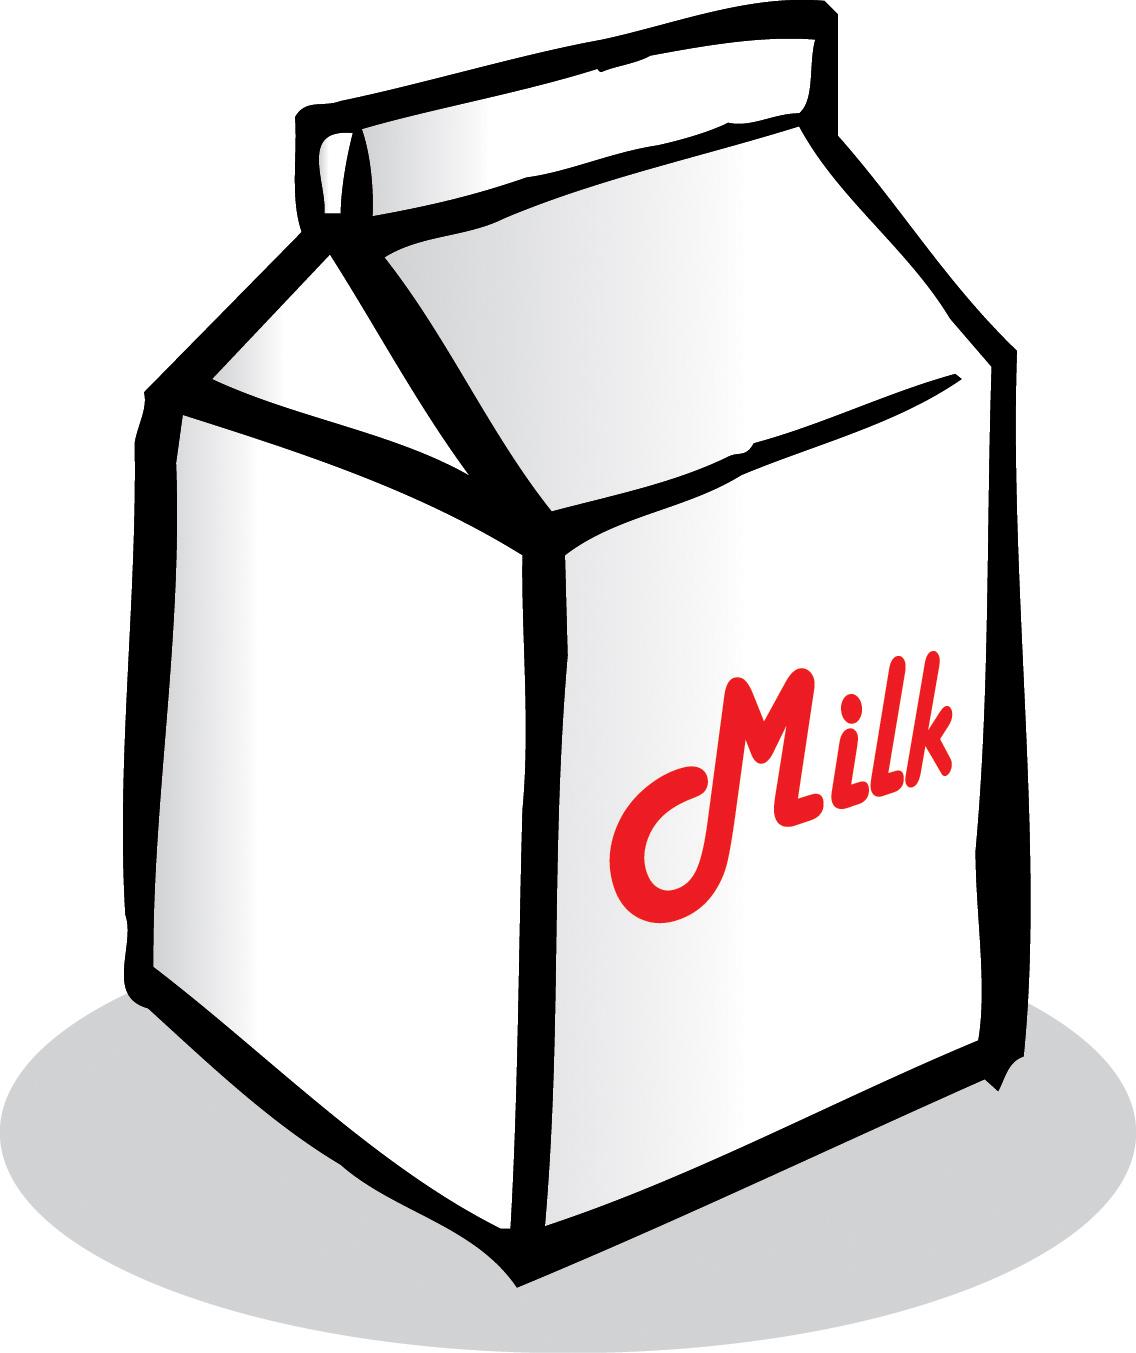 milk carton clipart clip art clipart panda free clipart images rh clipartpanda com milk carton clip art free